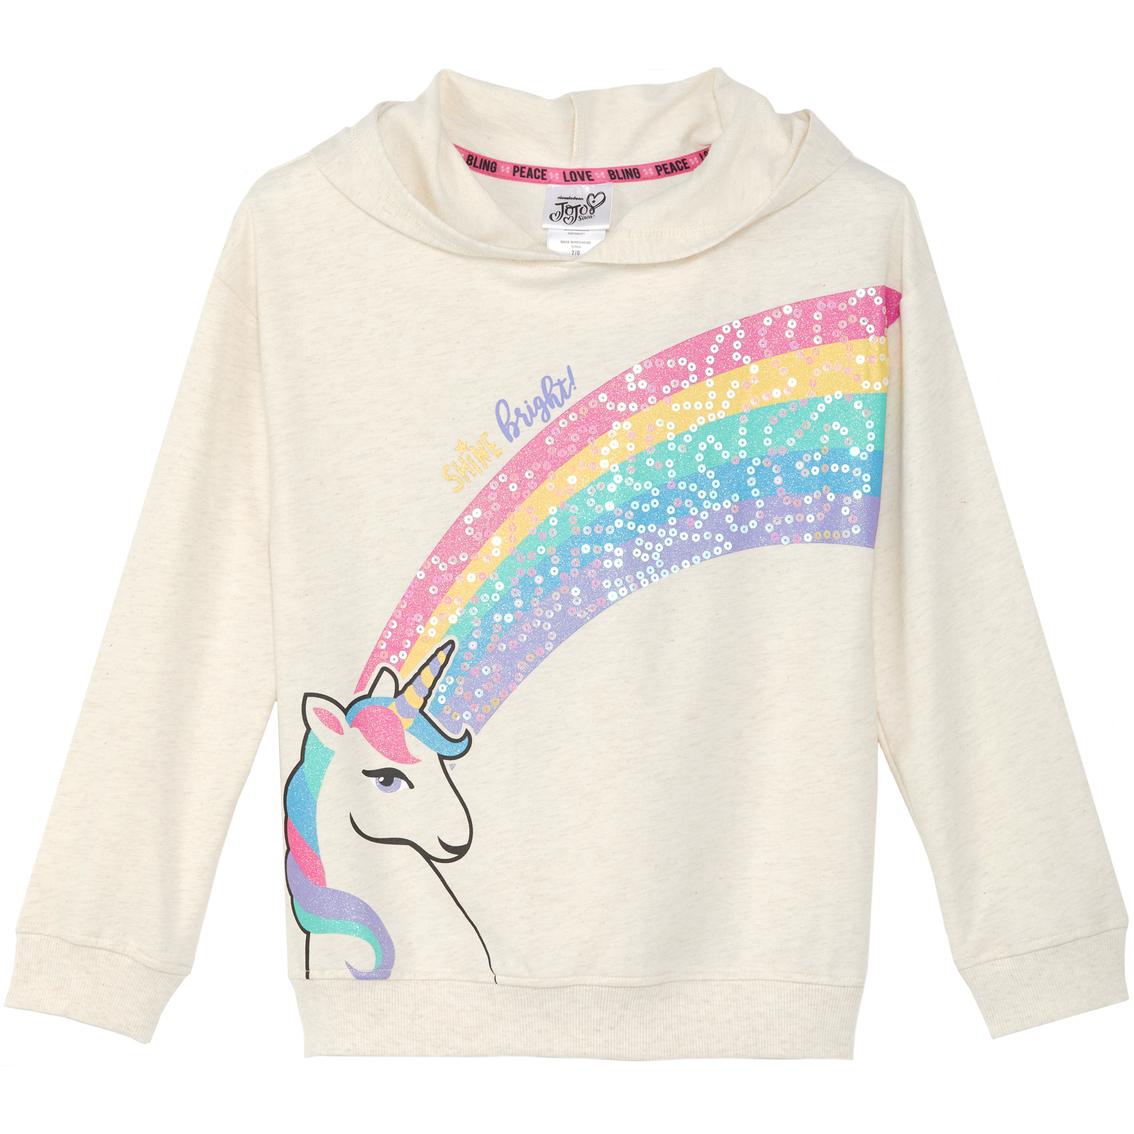 Girls Unicorn T-shirt Pink Size X Large 14-16 Blend Cotton with gift /& Free Ship